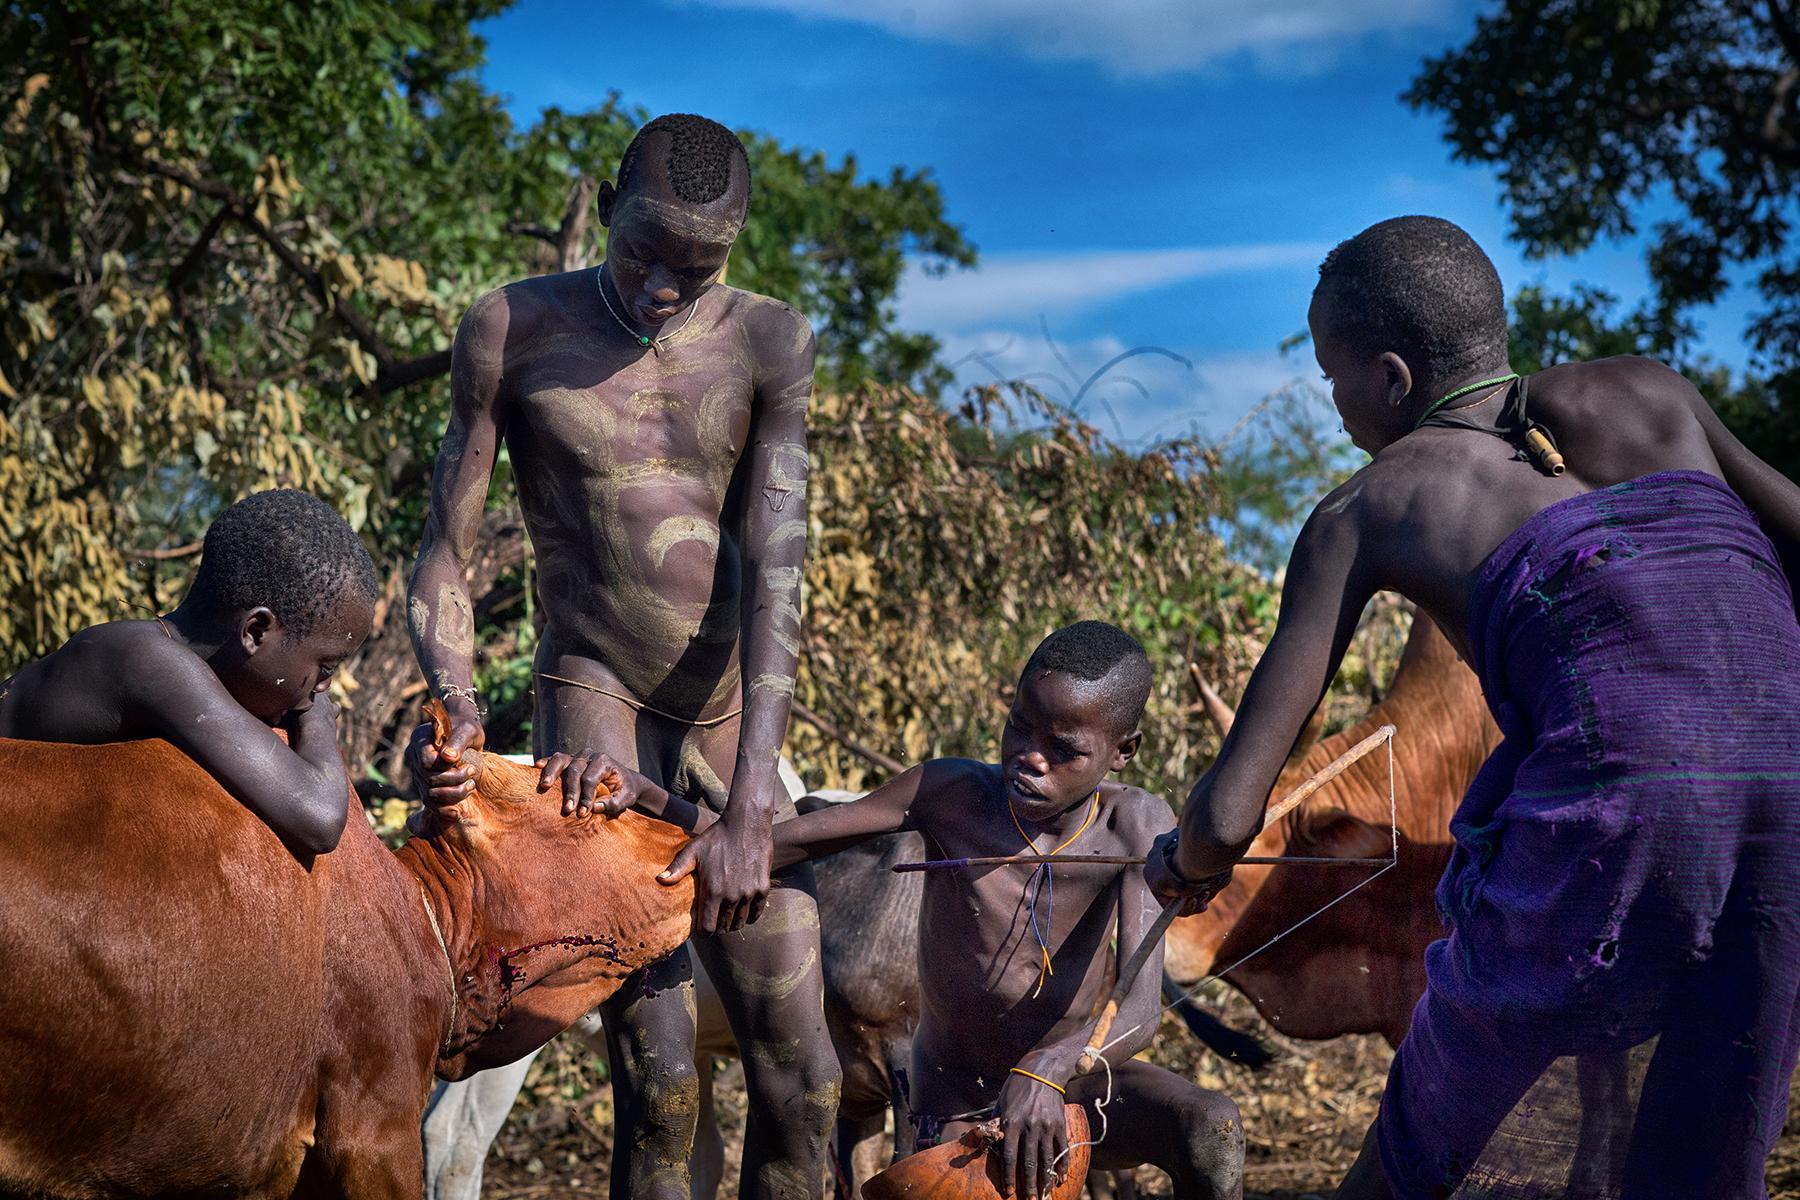 David Nam Lip_LEE_The Ritual Belong To The Suri Tribe Of Ethiopia_Cow Blood Drinking_08.jpg